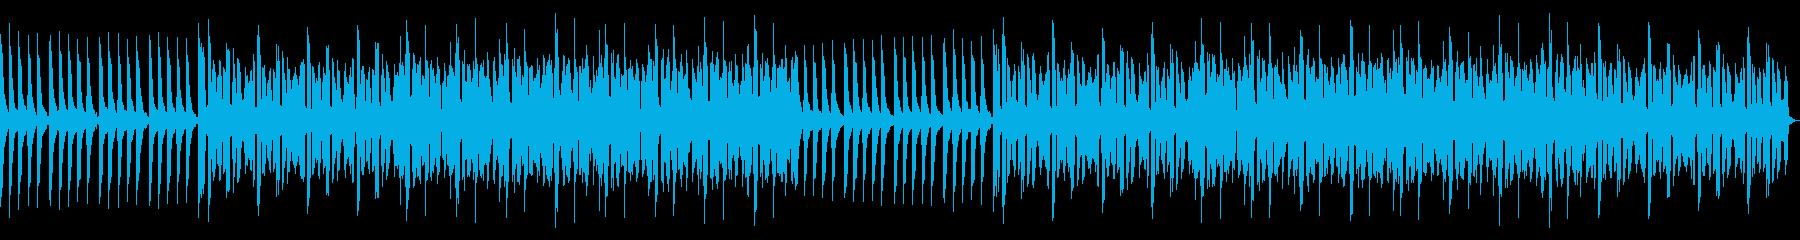 Digital. graphic. Techno_4's reproduced waveform